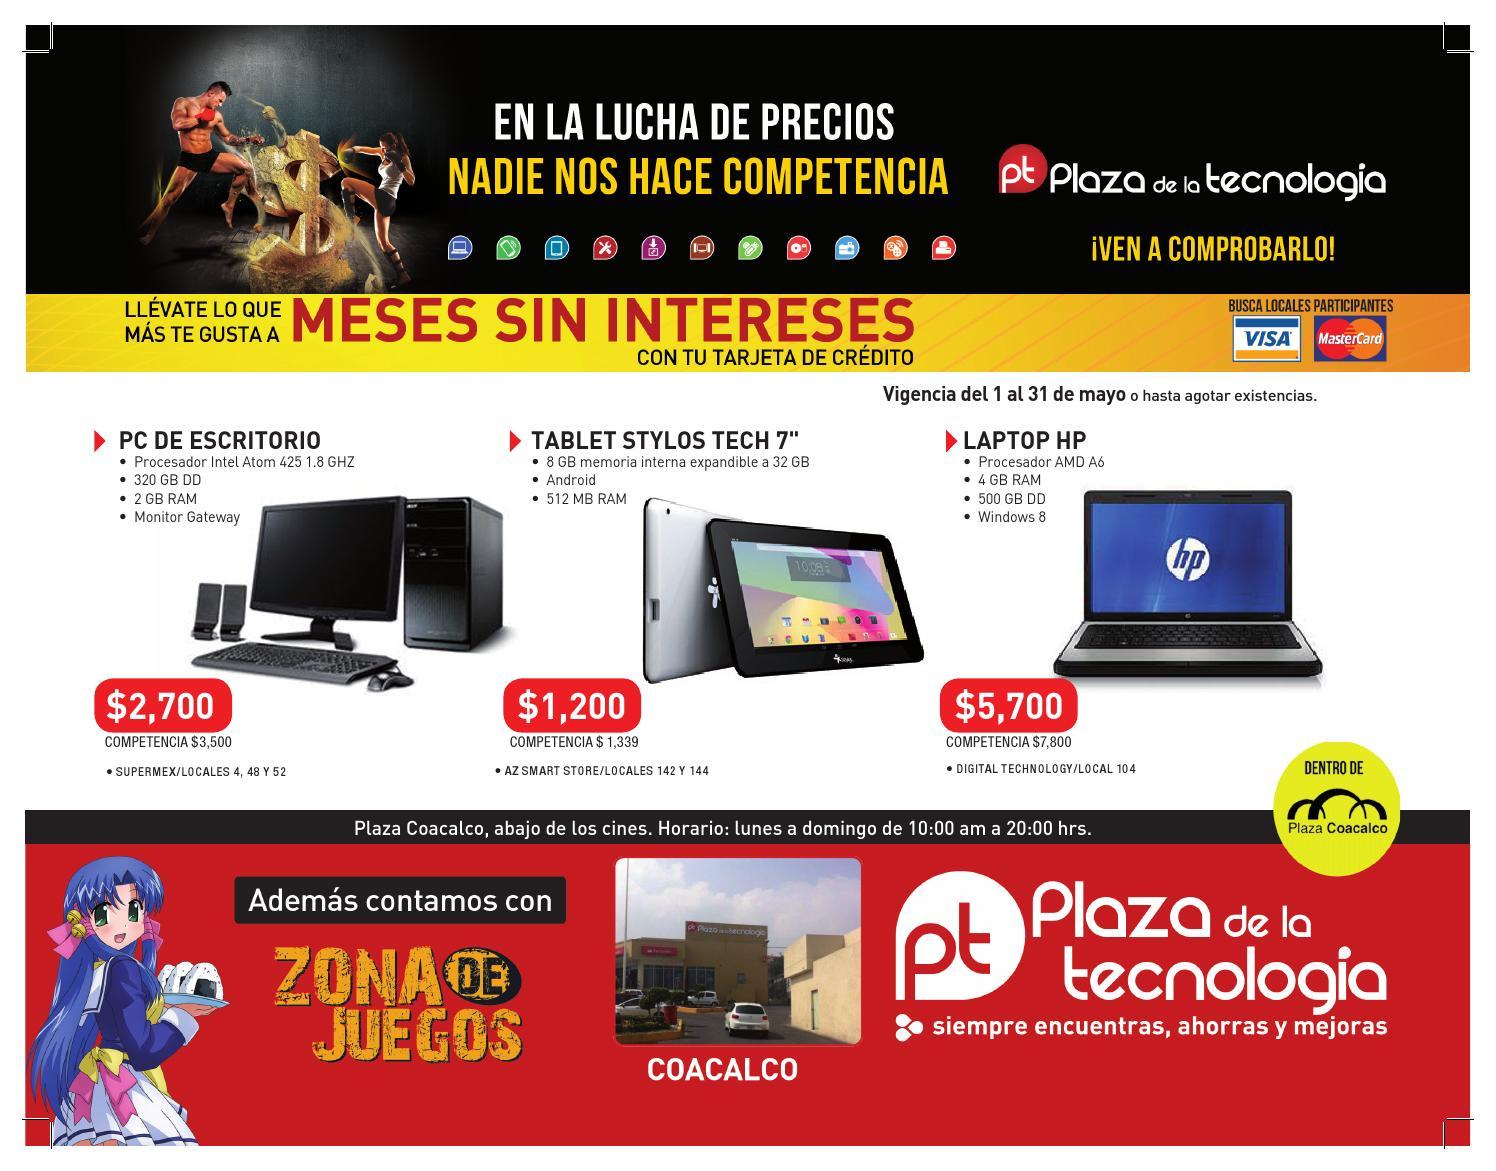 folleto de plaza de la tecnolog237a coacalco mayo 2014 by